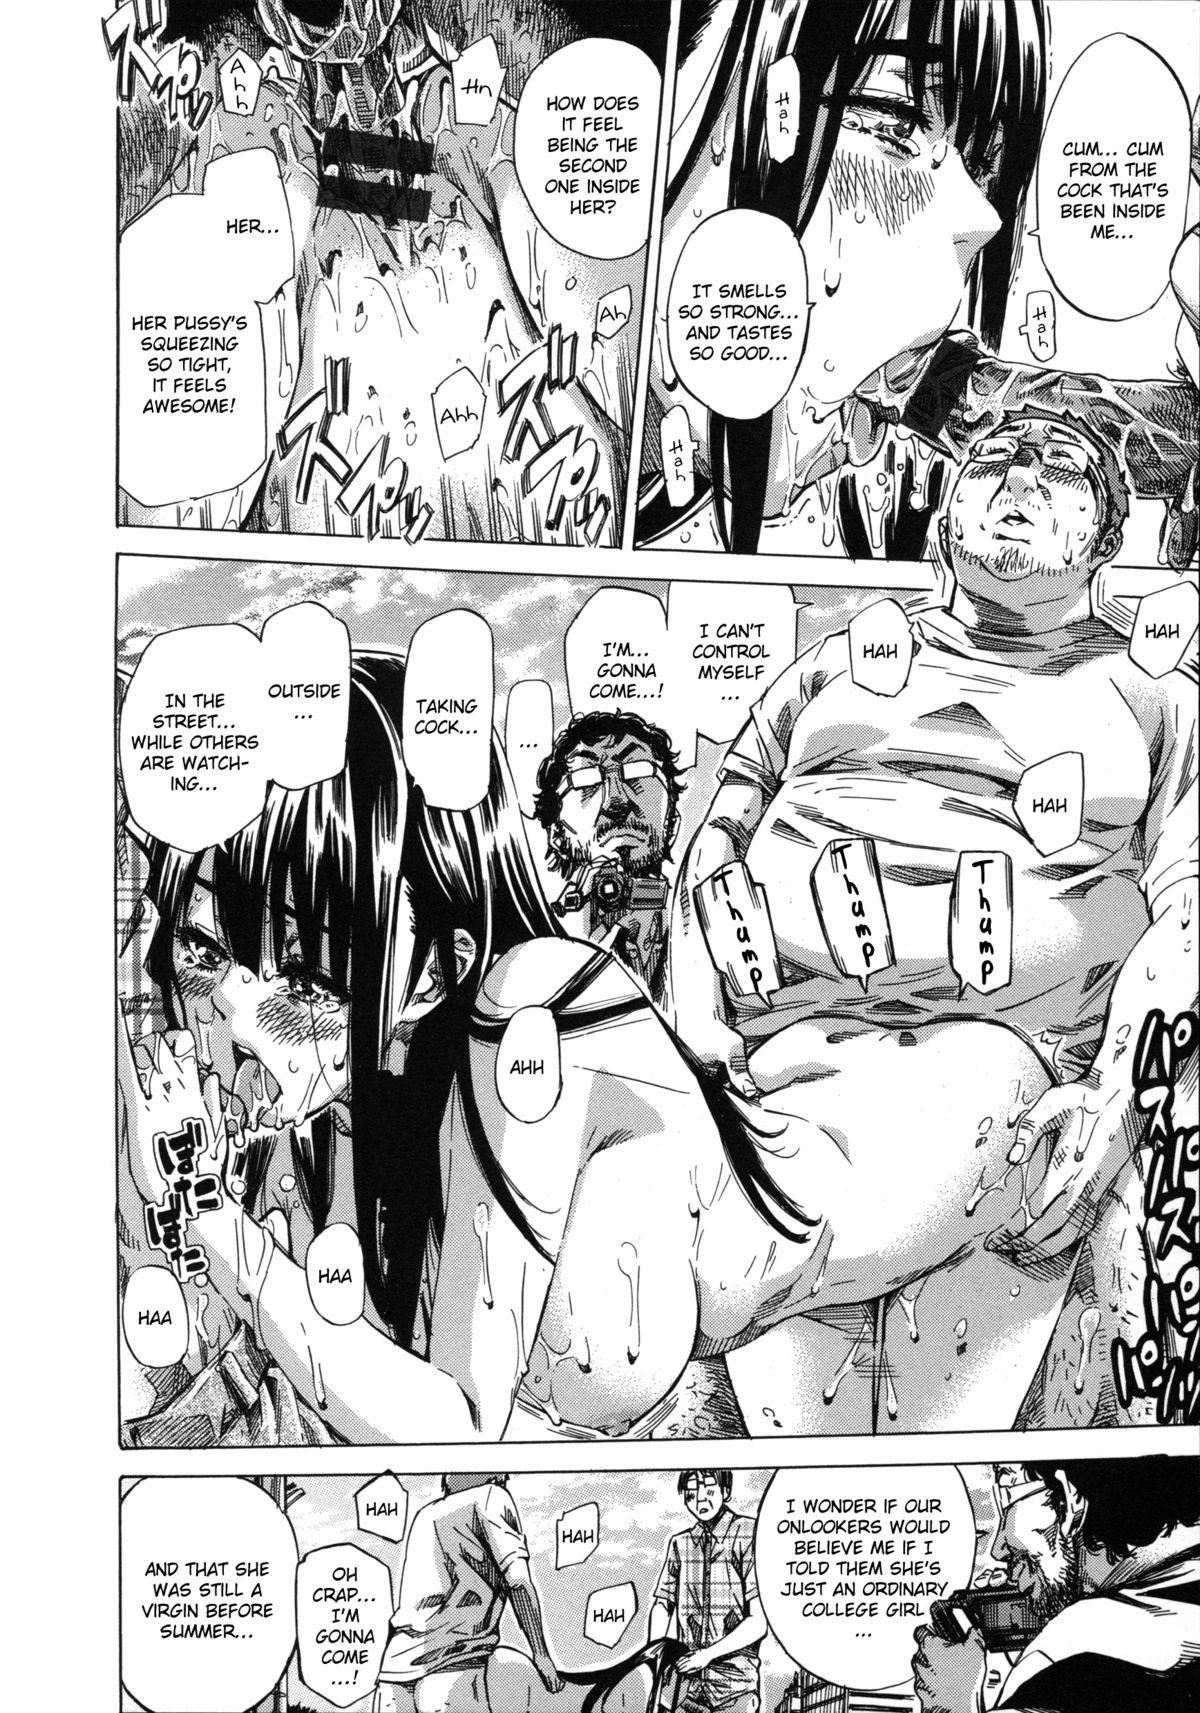 Kashiwazaki Miki wa Ironna Basho de Zenra Sanpo Shitemita | Miki Kashiwazaki Goes Naked in All Sorts of Places 202